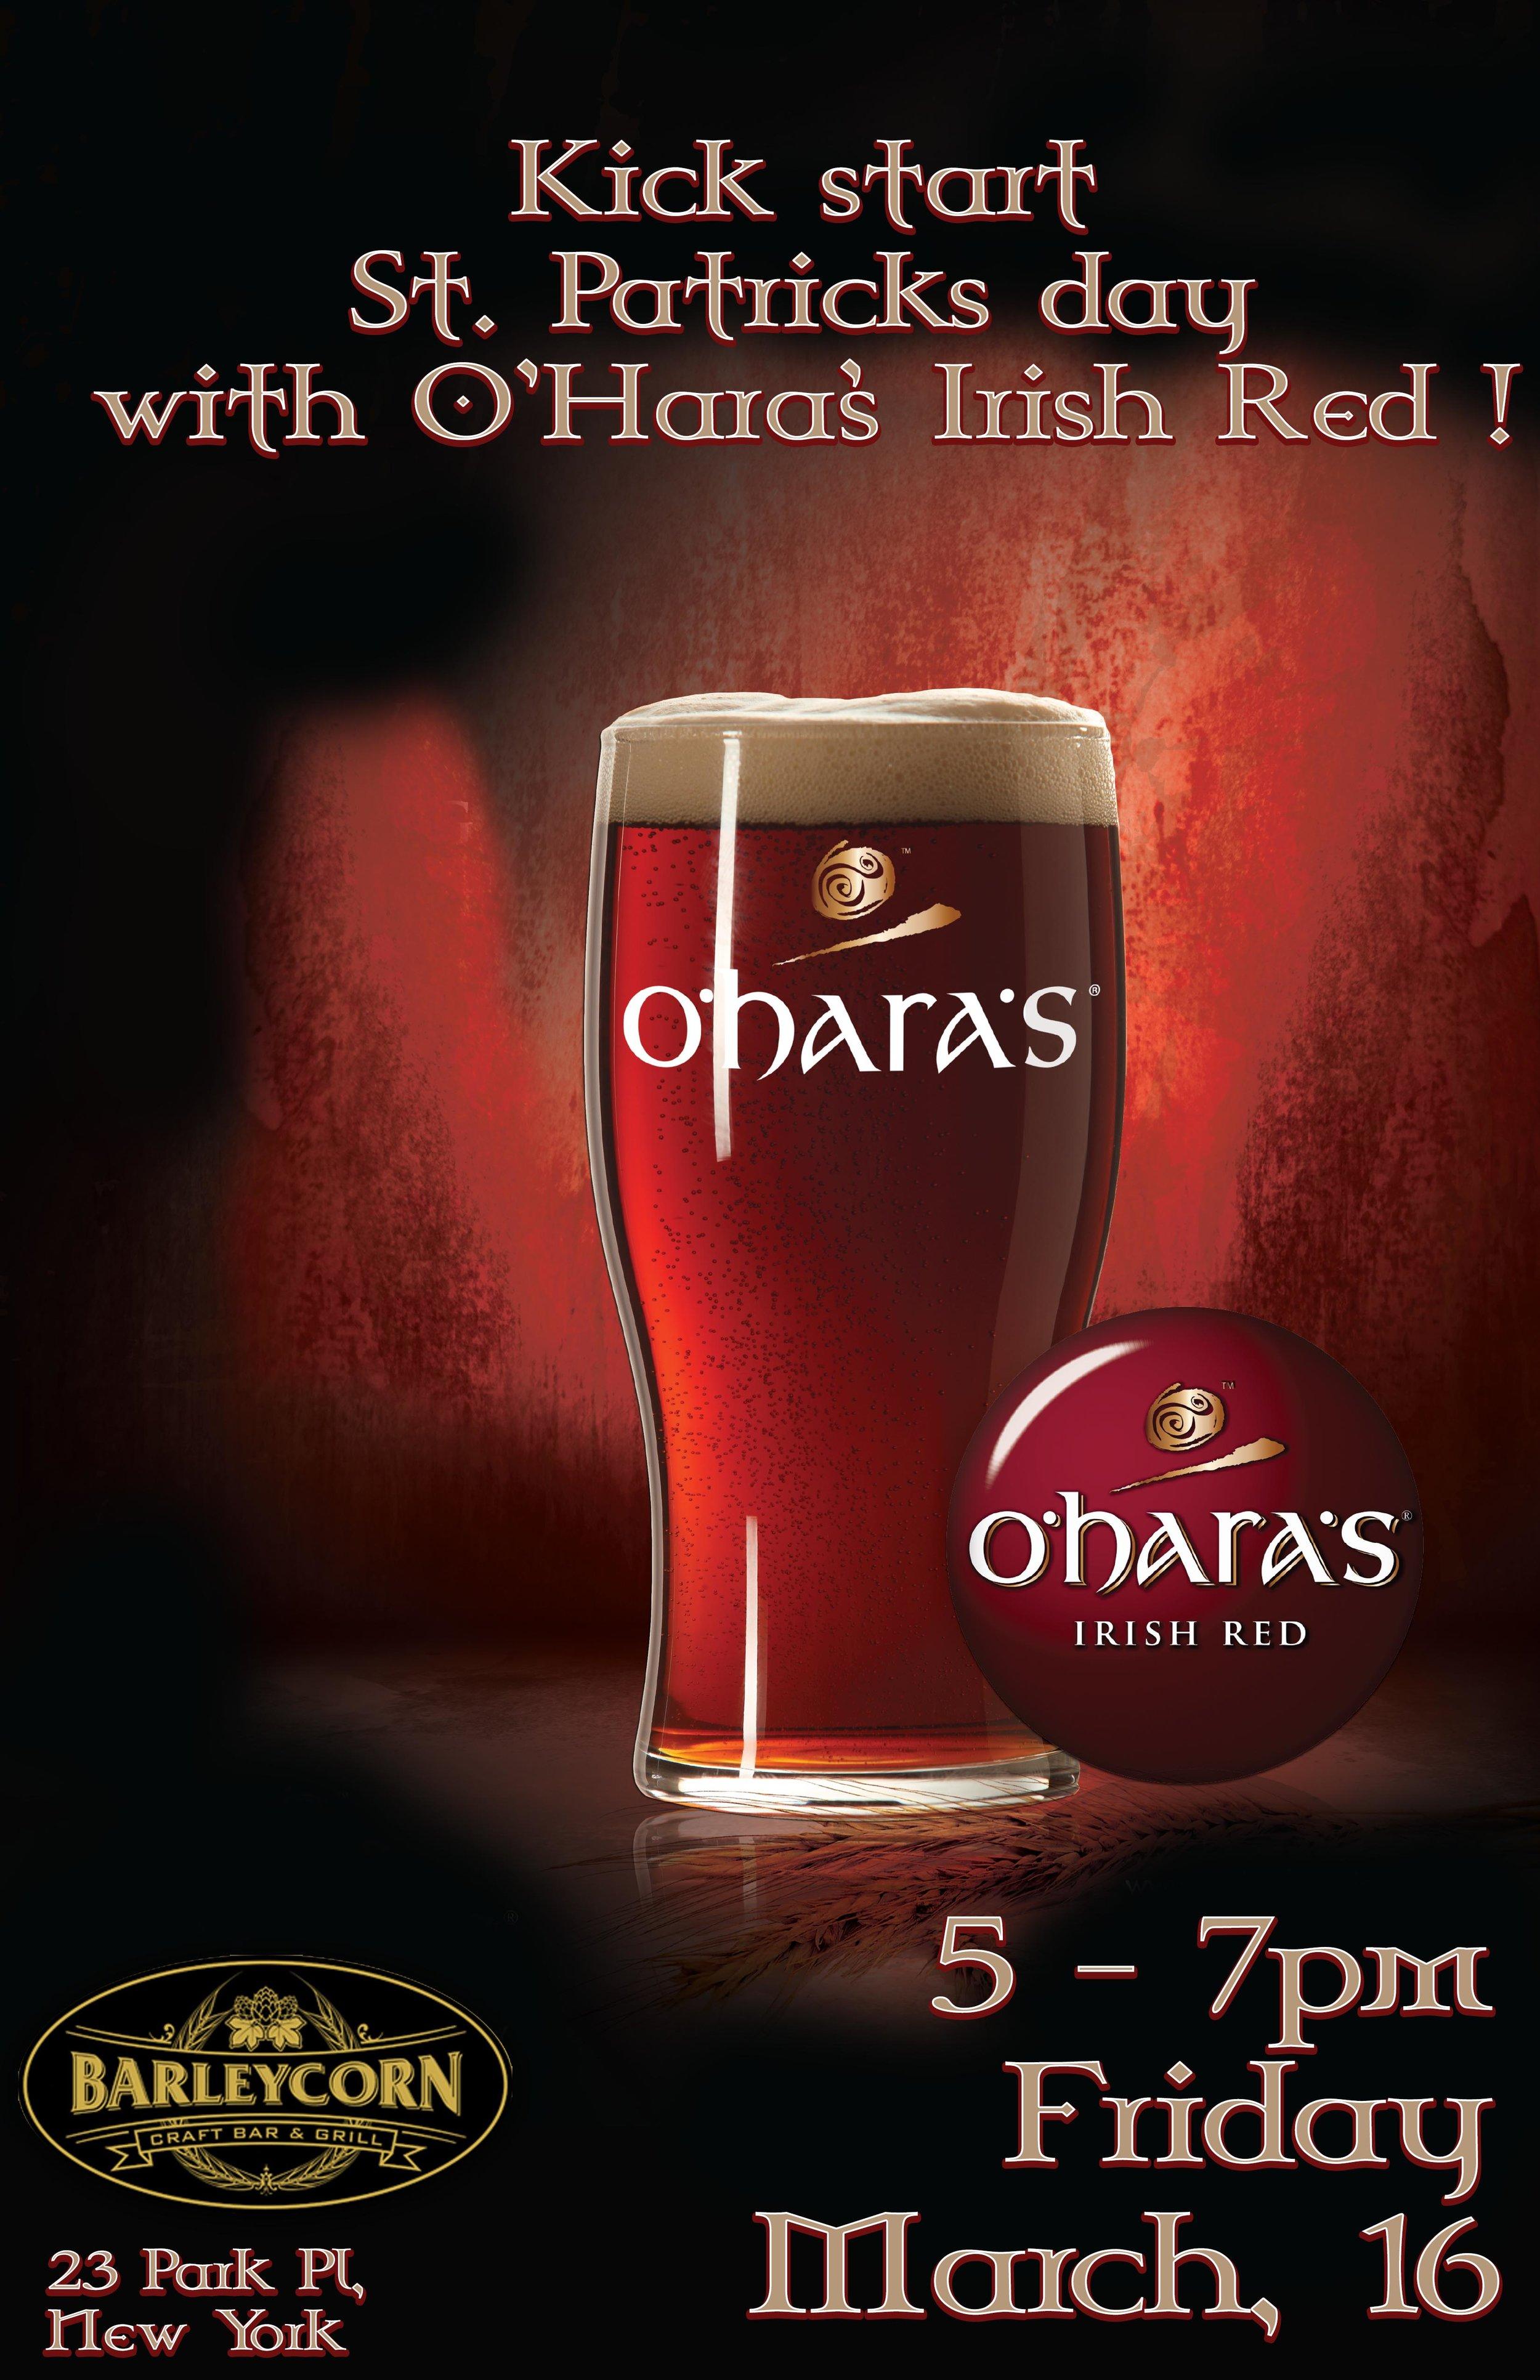 BARLEY CORN_OHARAS IRISH RED KICK OFF.jpg